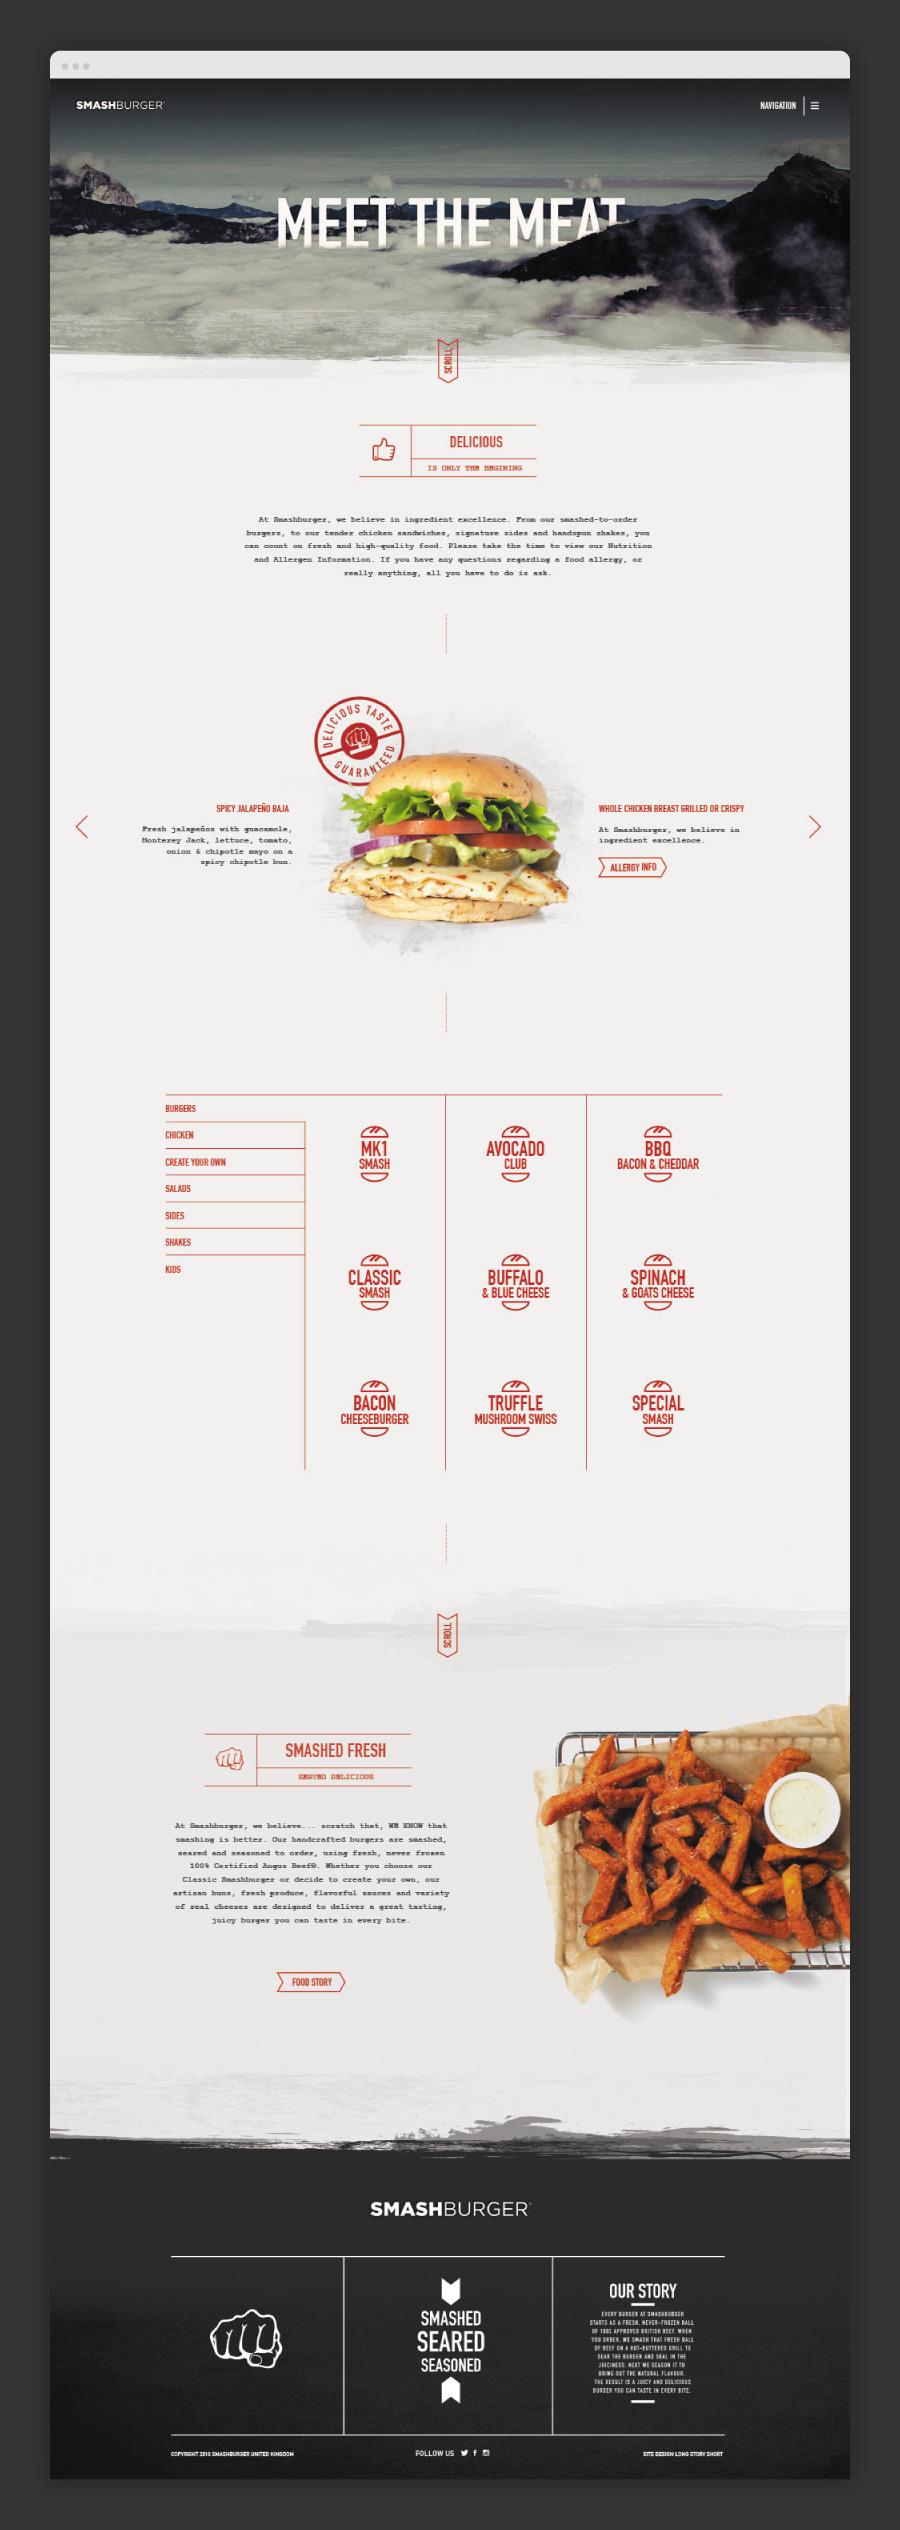 Smash Burger Homepage Design